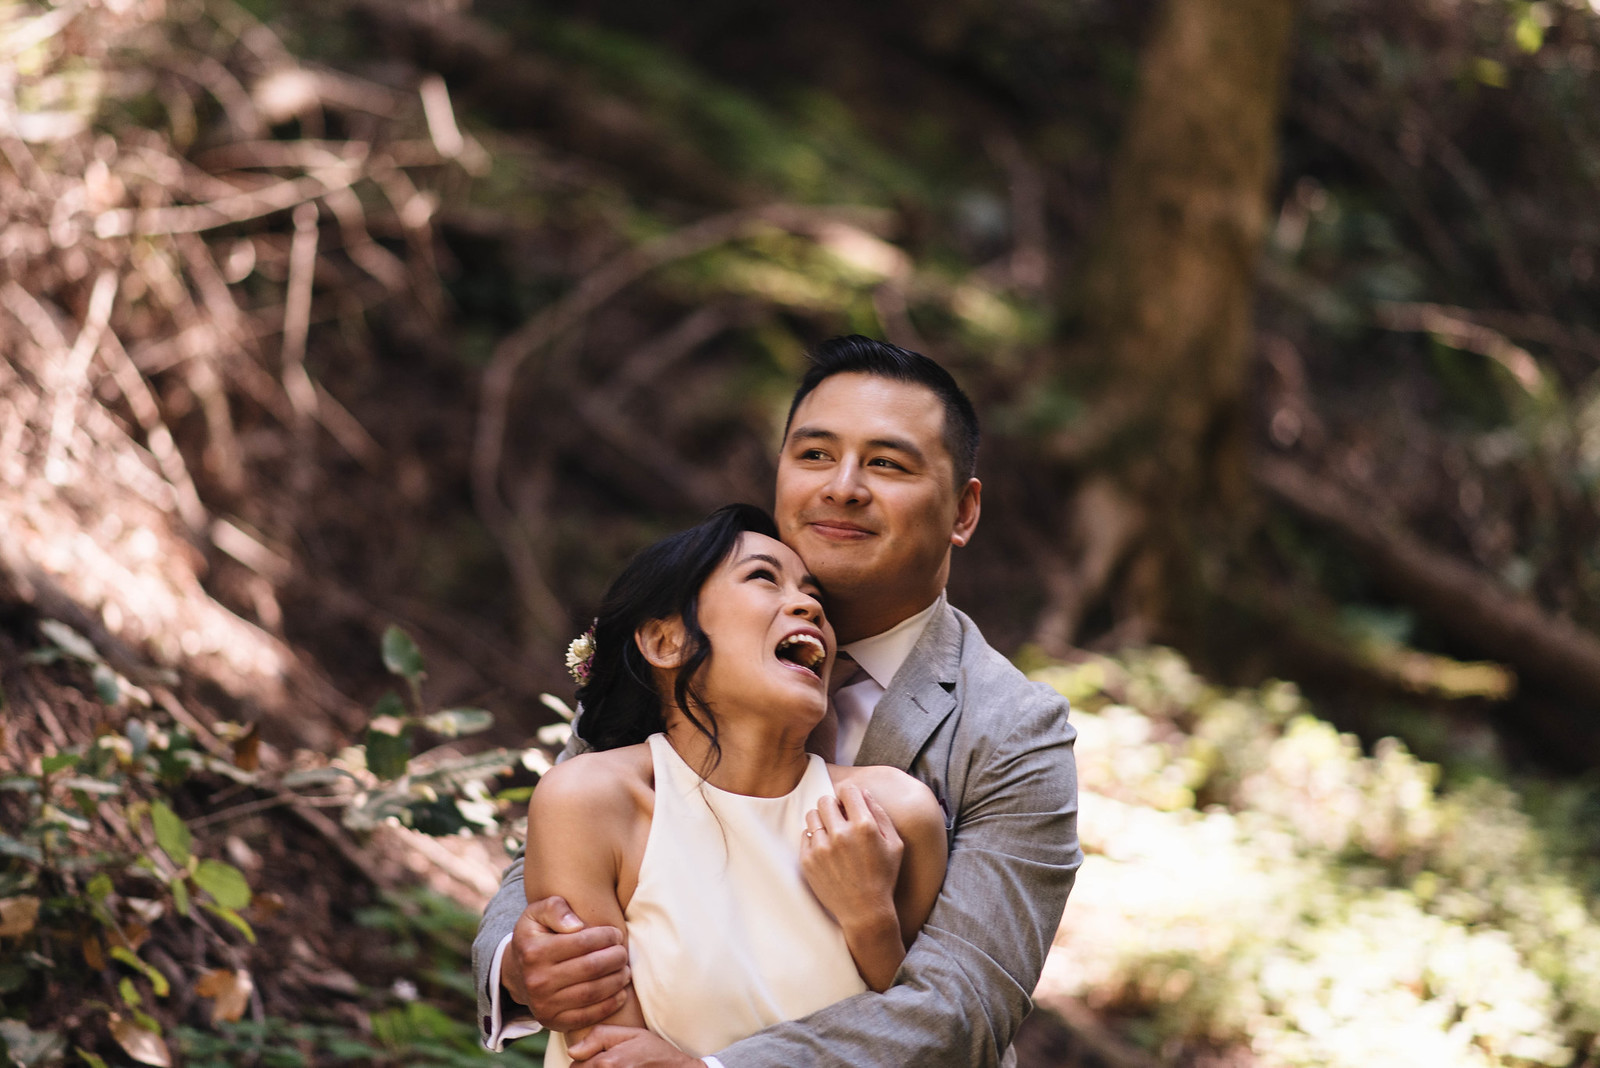 Playful Couple Wedding Photography on juliettelaura.com